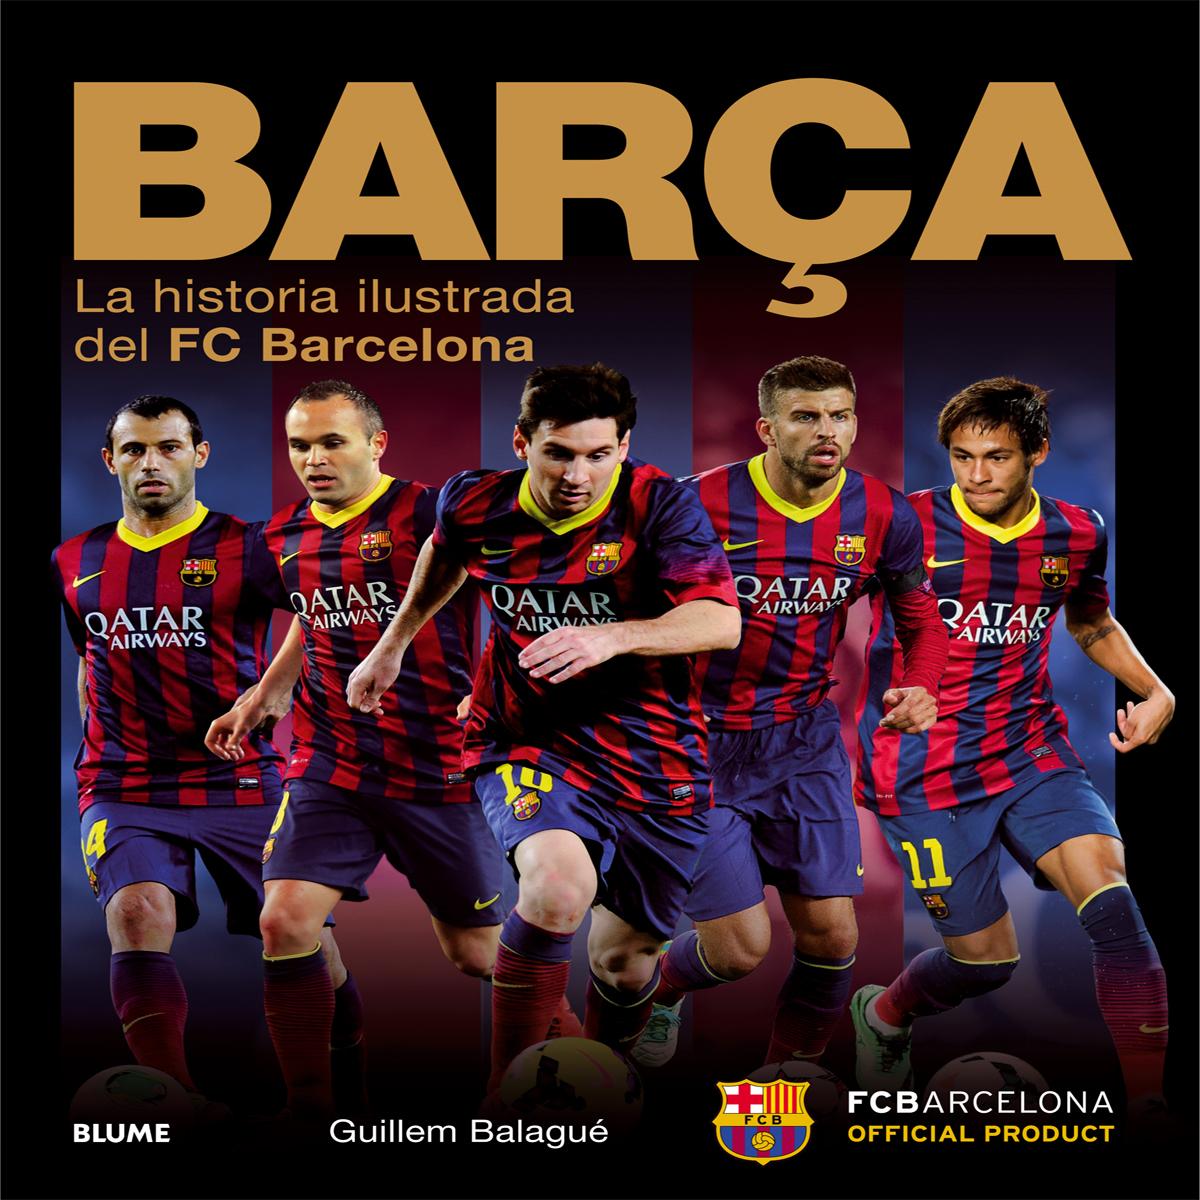 BARÇA, LA HISTORIA ILUSTRADA DEL FC BARCELONA